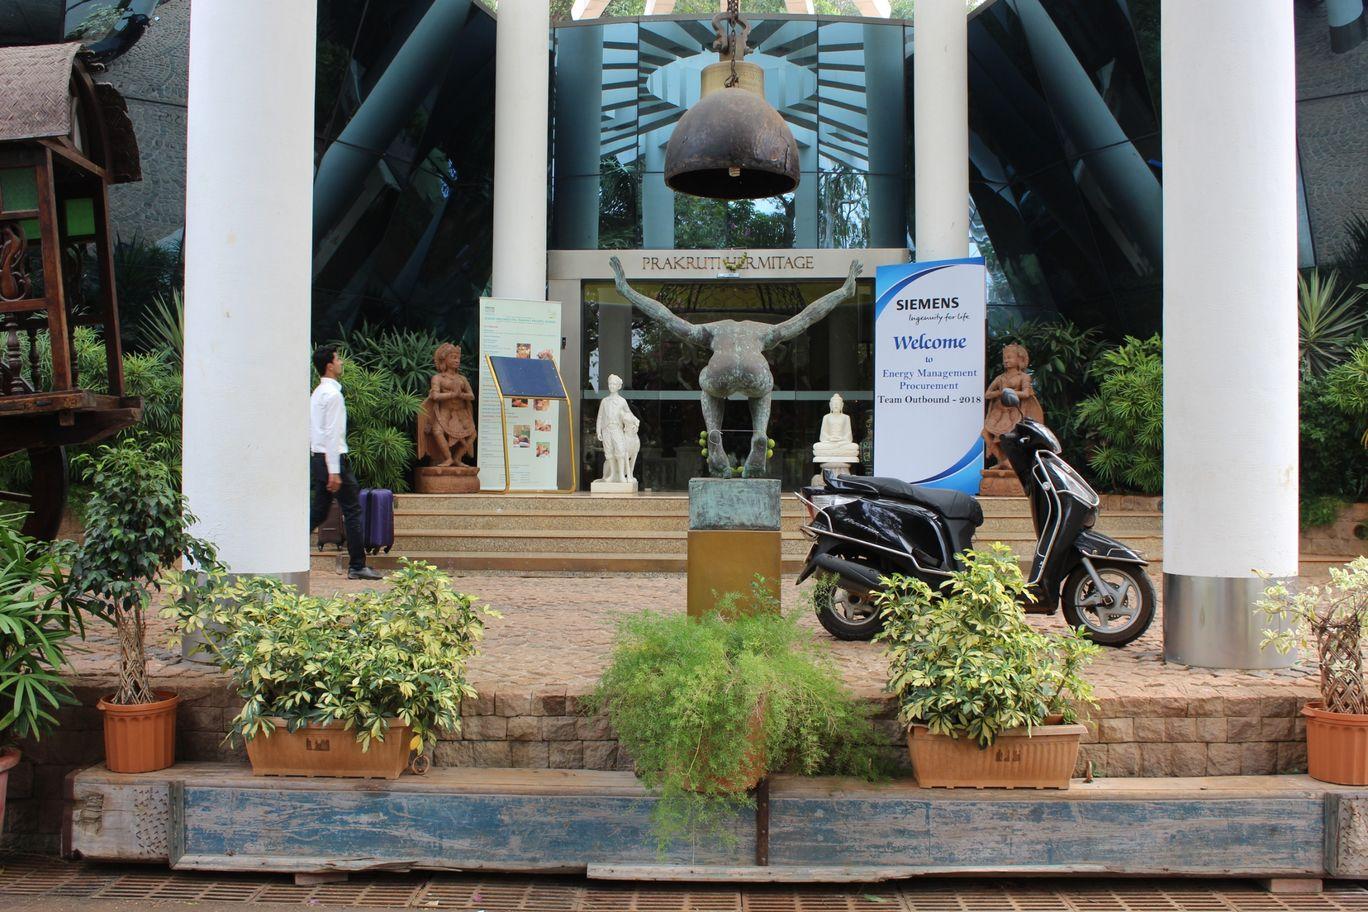 Photo of Prakruti Resorts By Gaurav Singham